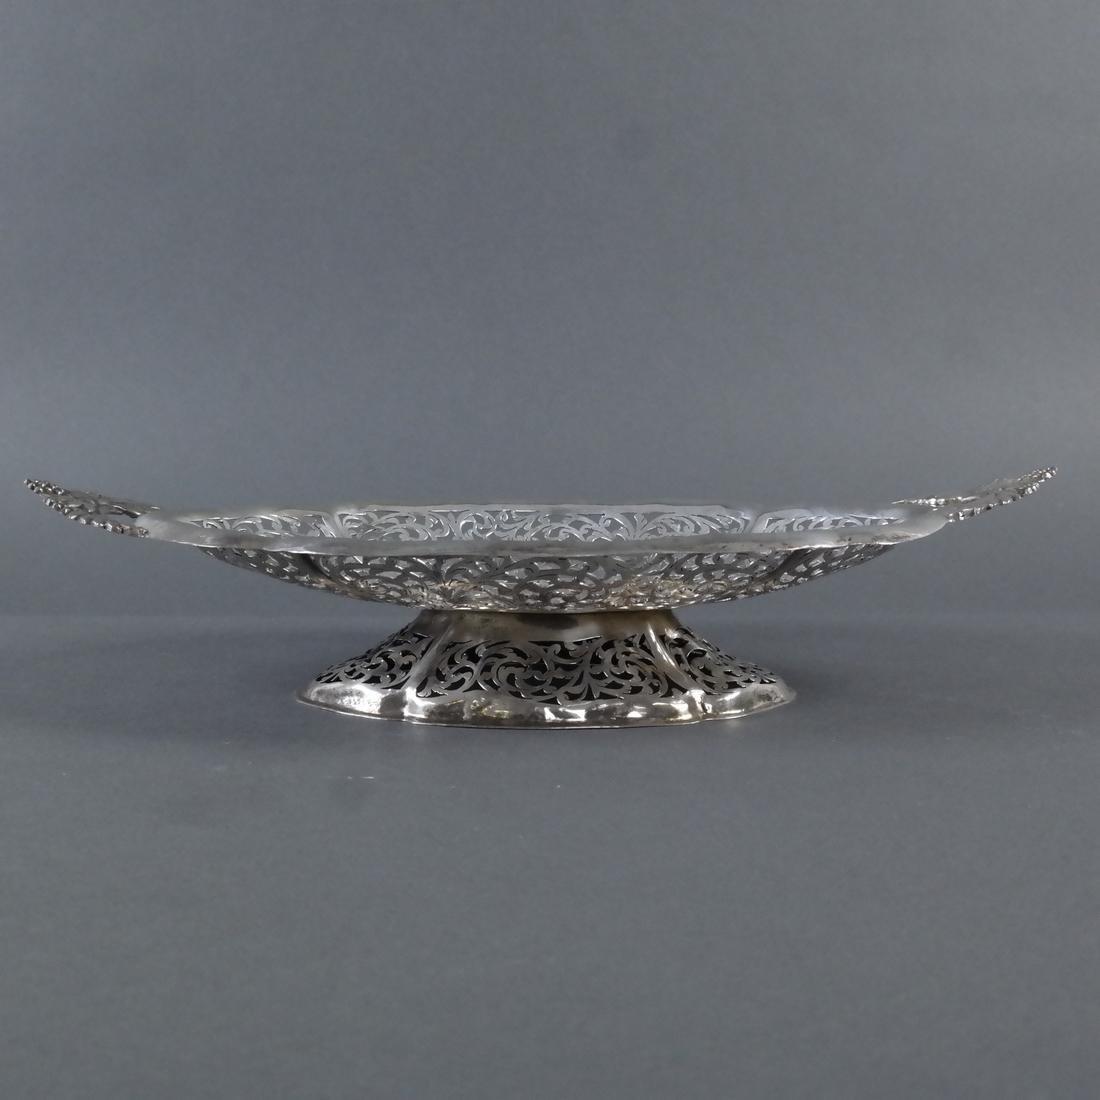 .900 Standard Silver Pierced Compote - 3